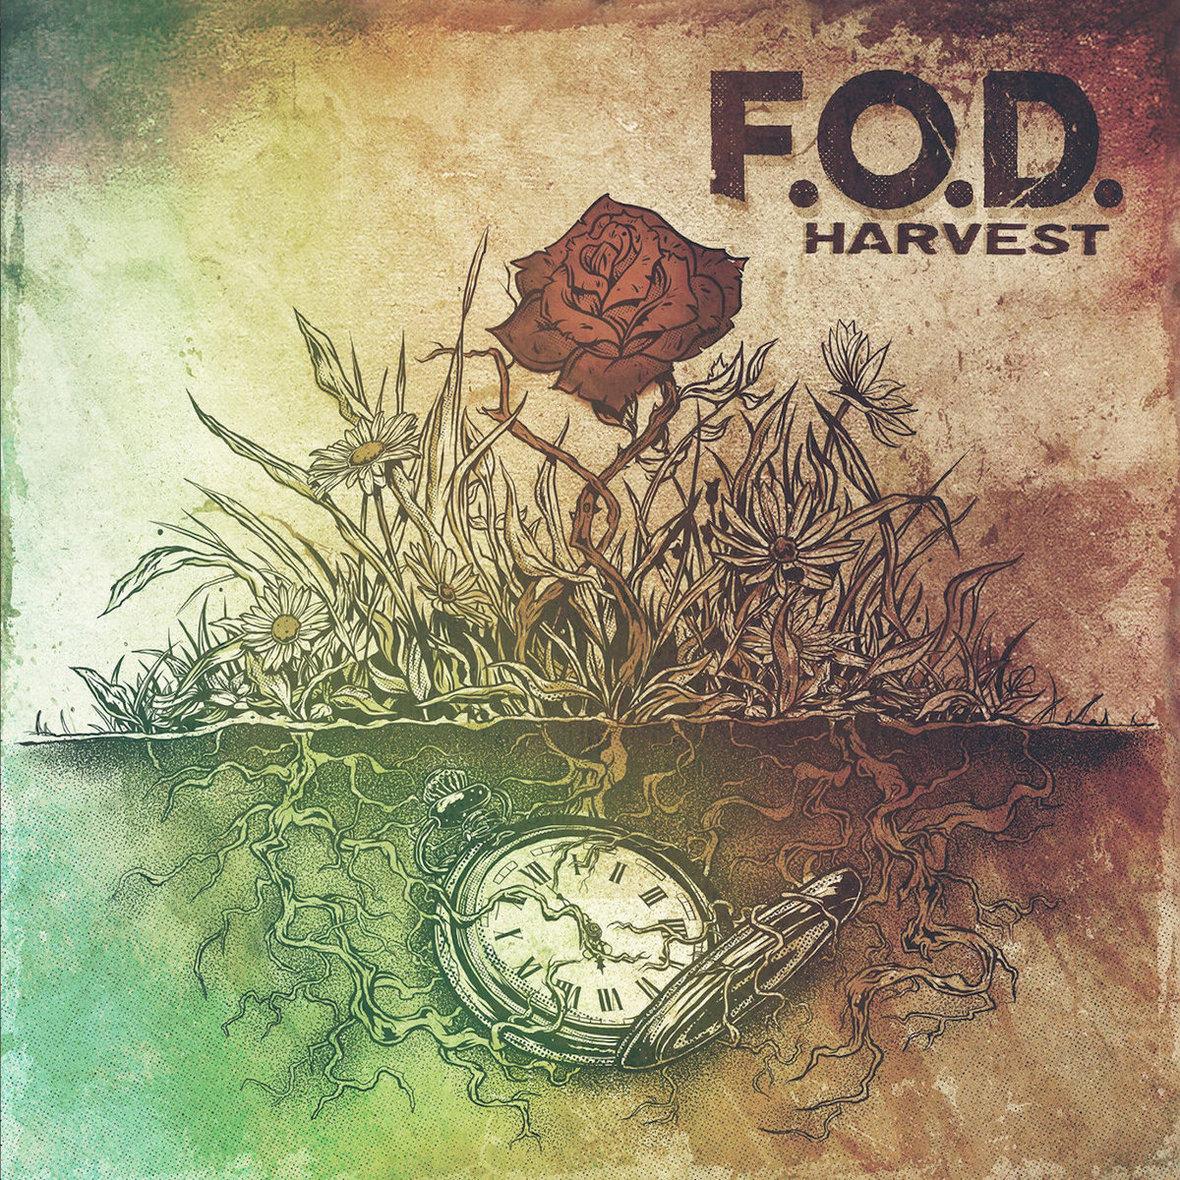 FOD - Harvest